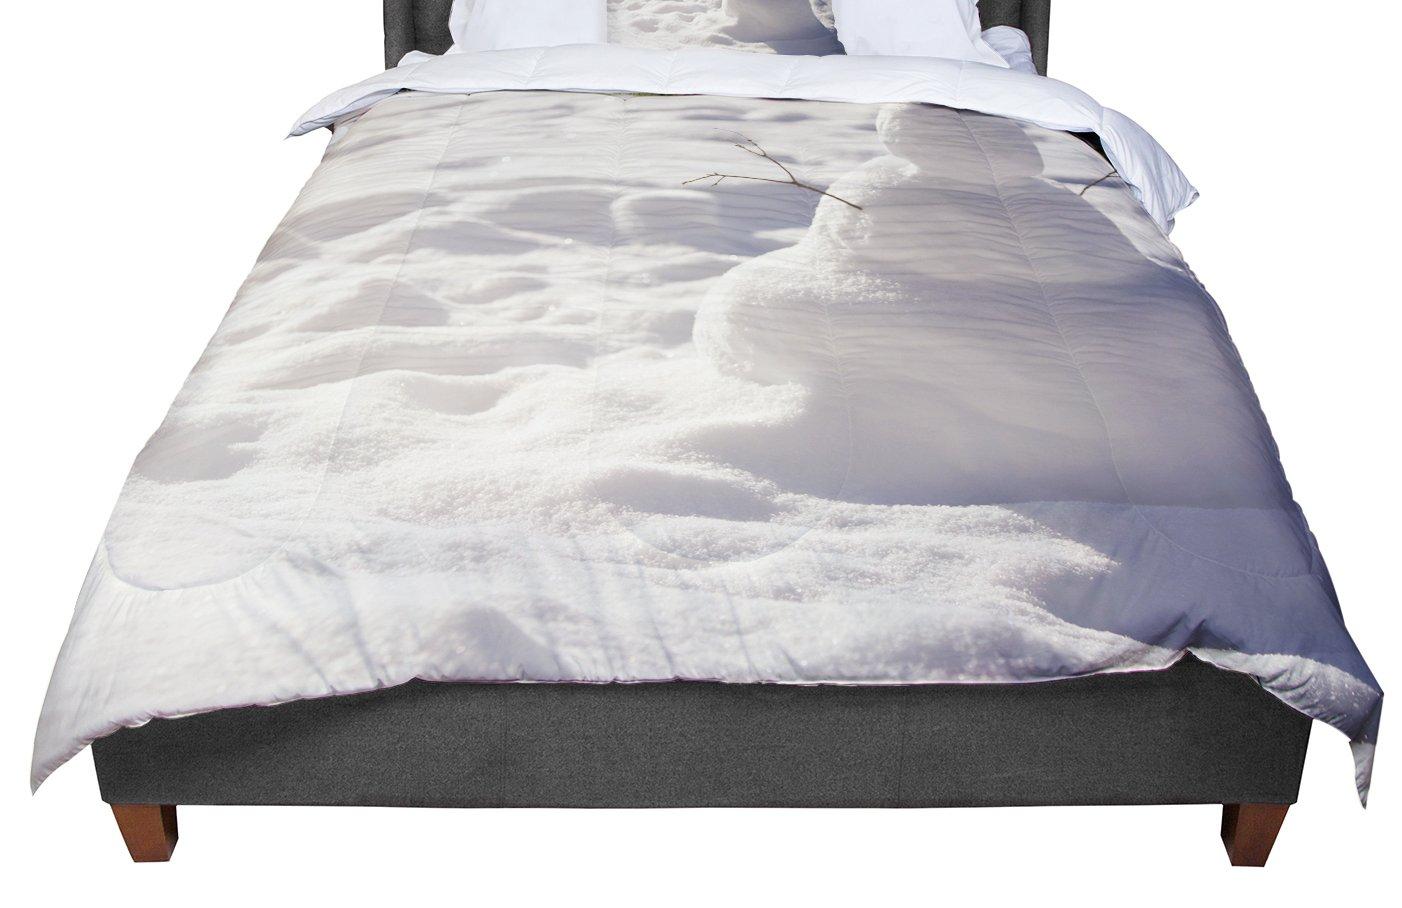 KESS InHouse Angie Turner Snowman White Nature Twin Comforter 68 X 88